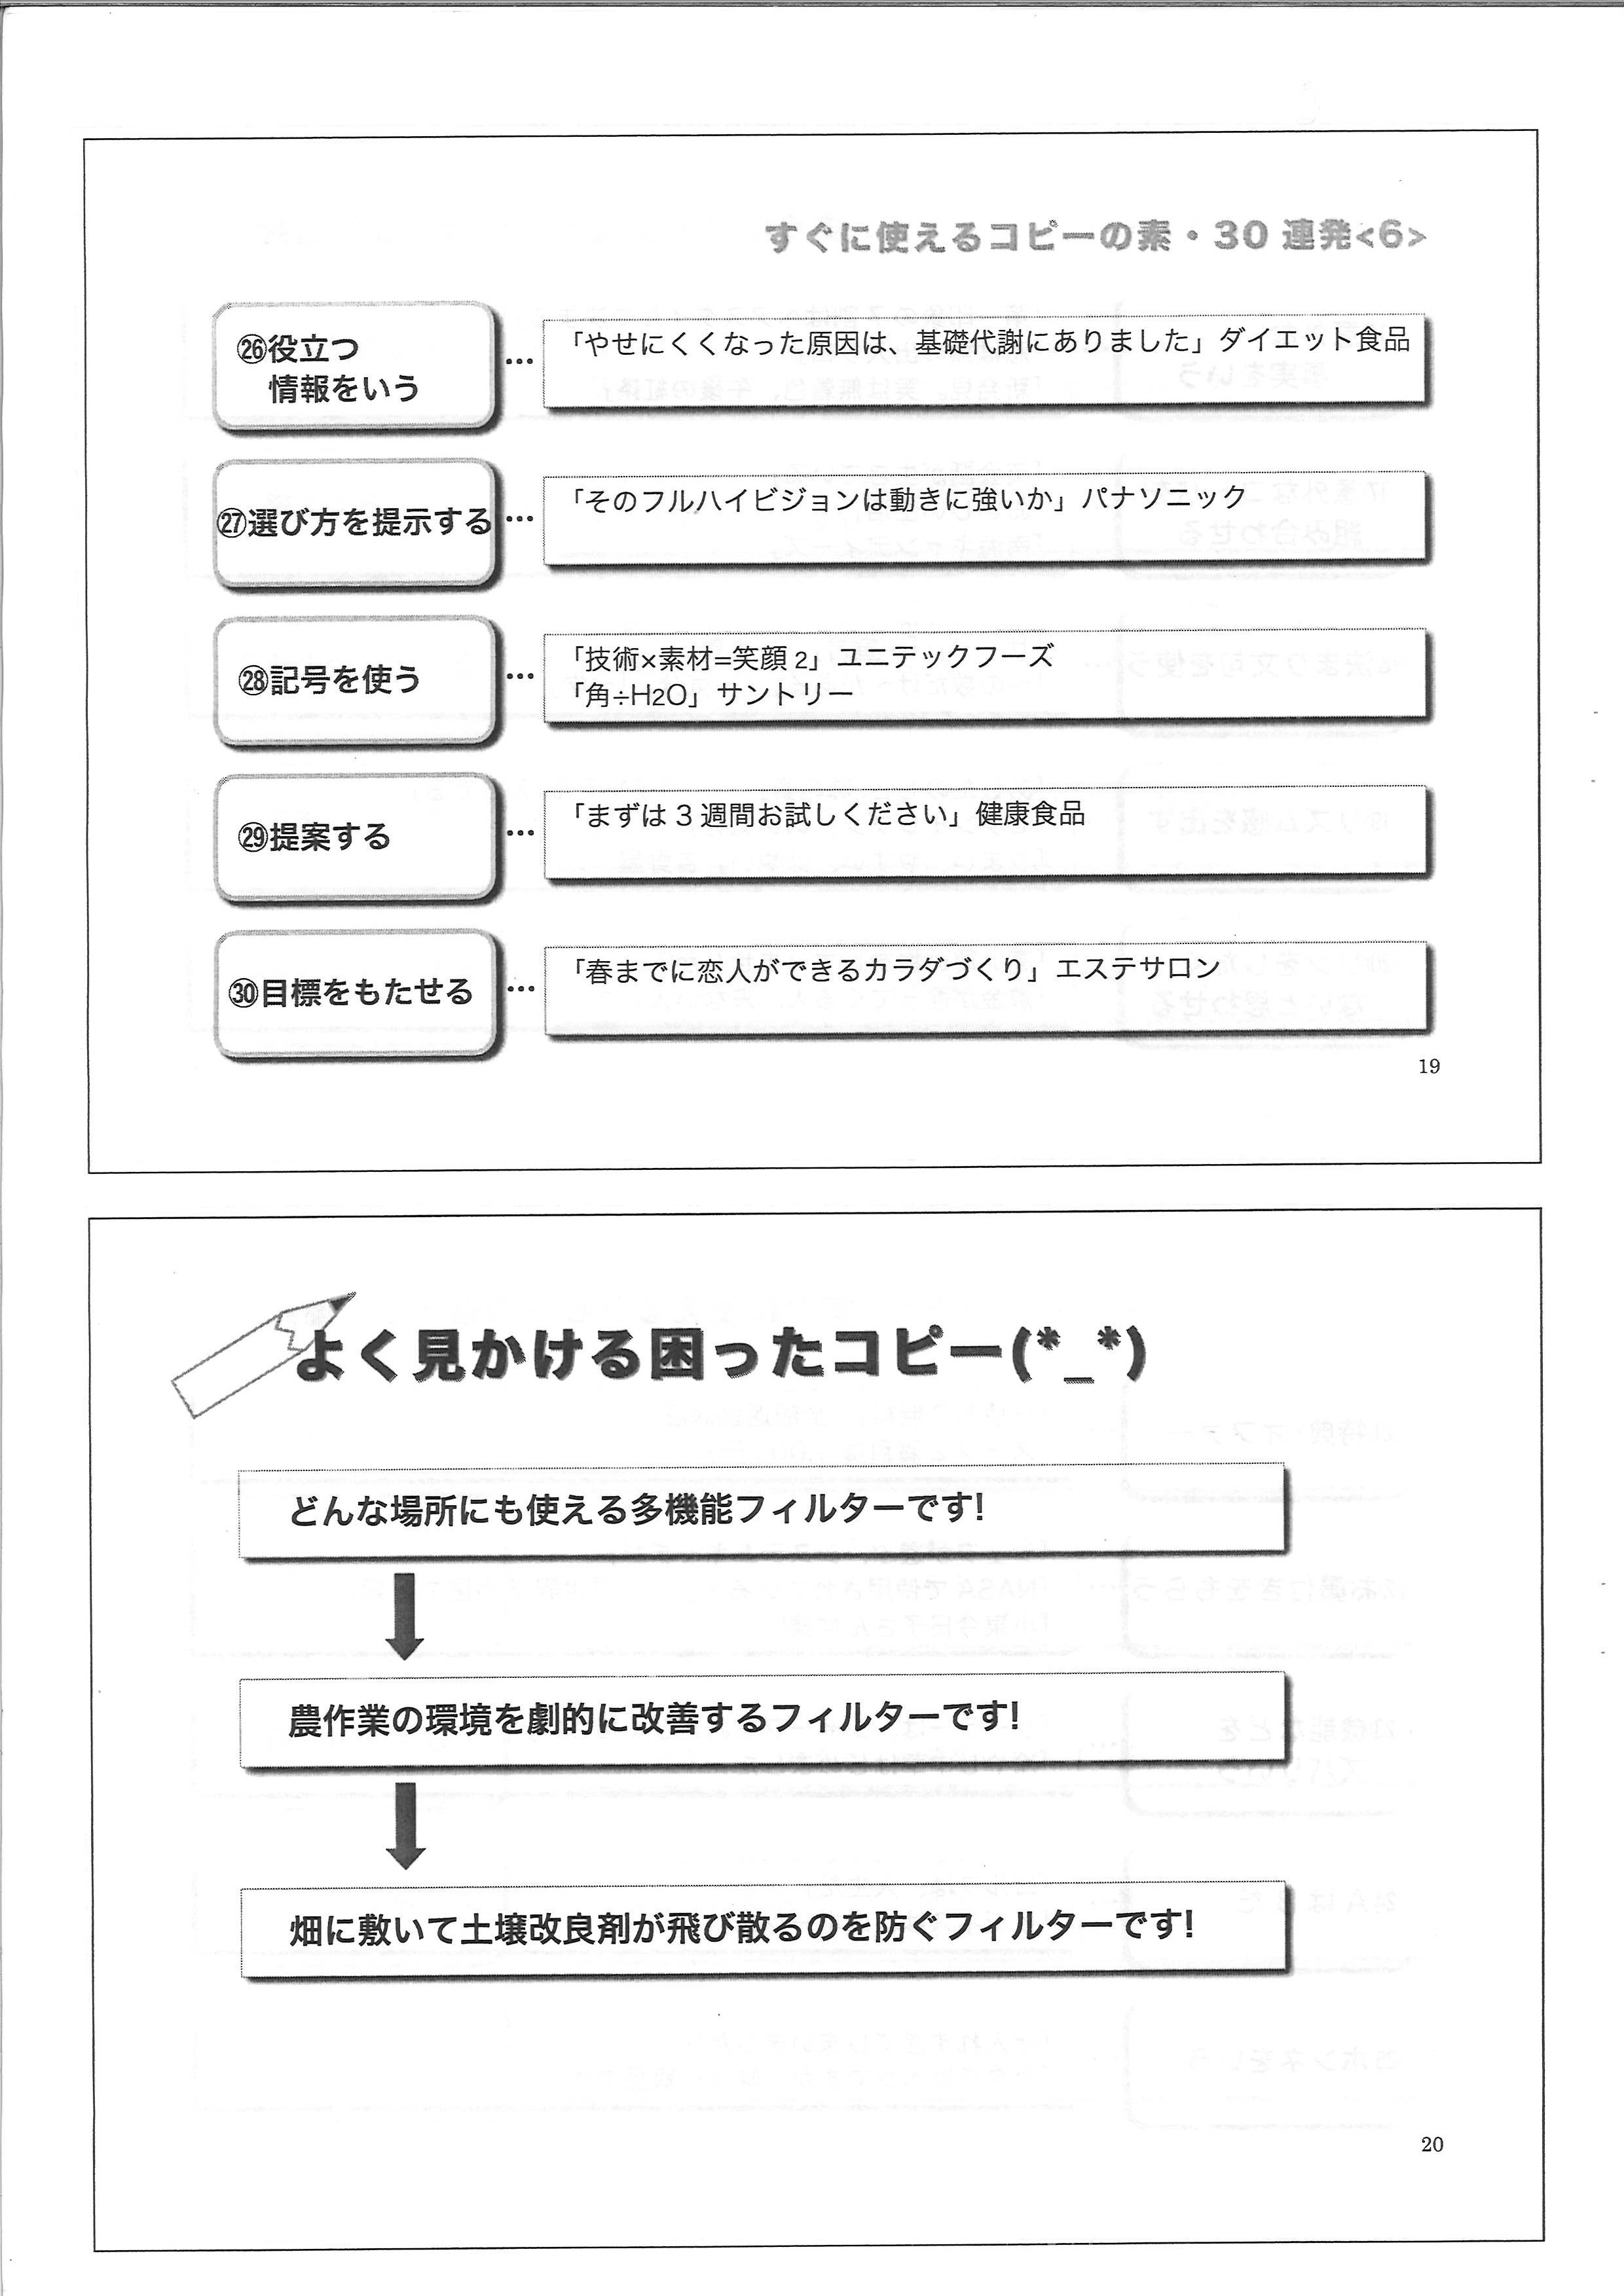 20130920111612_00004